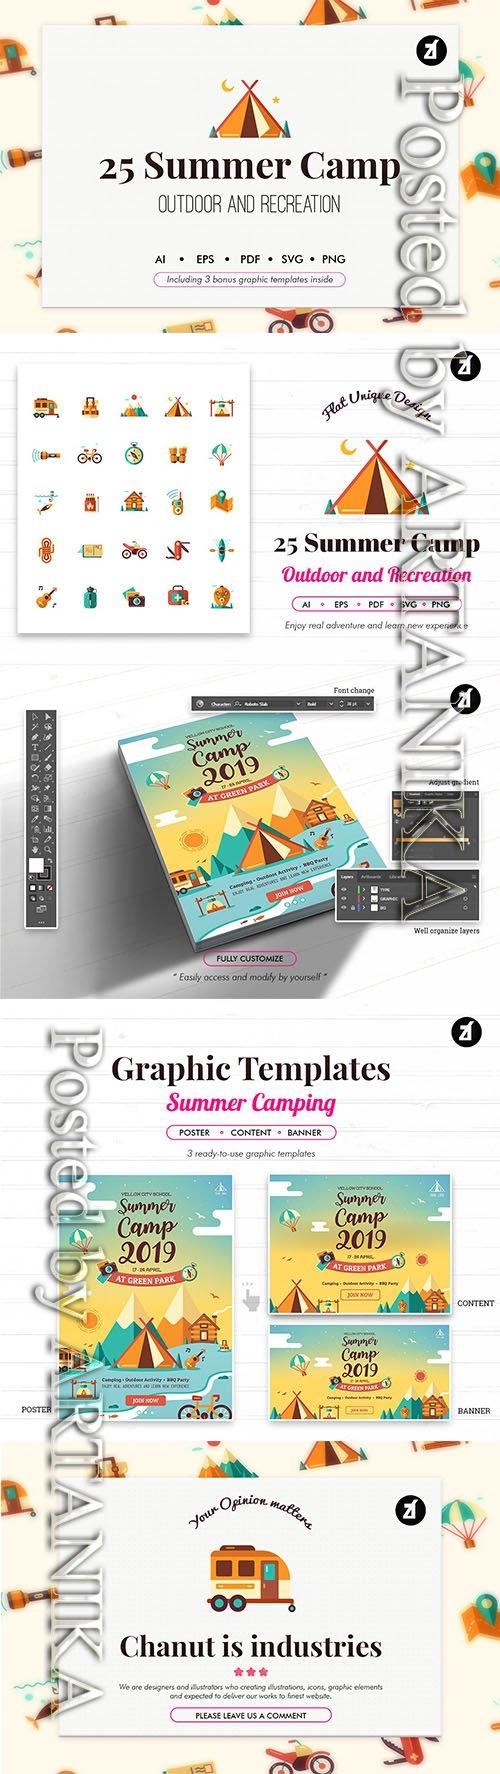 25 Summer Camp icons with bonus graphic templates